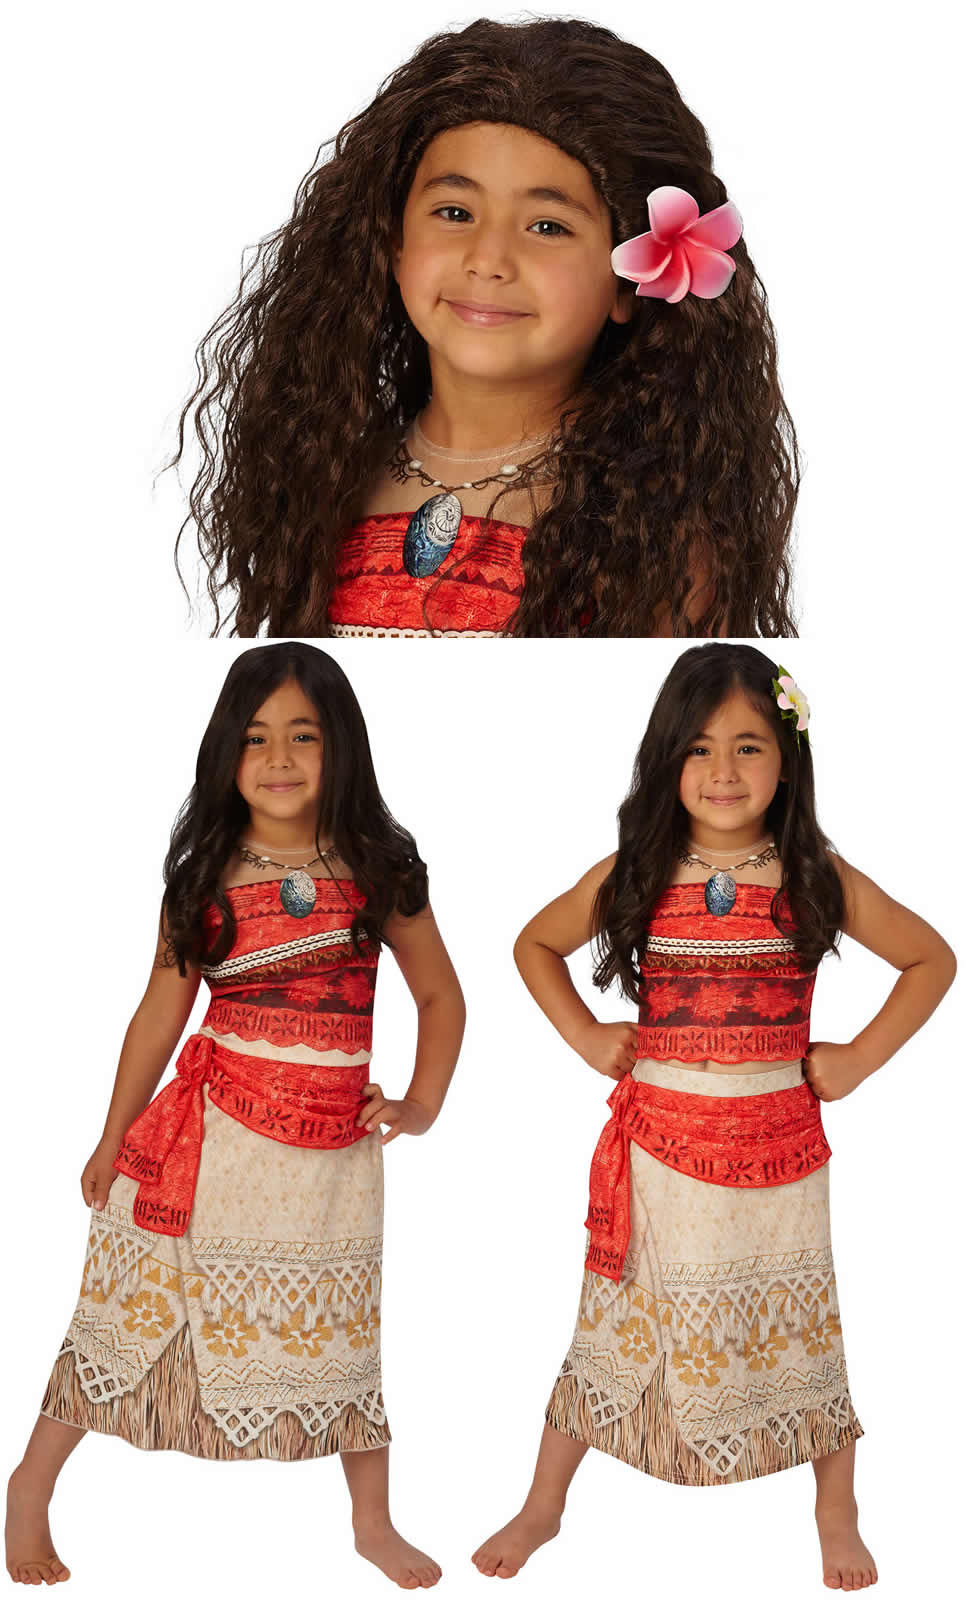 Vaiana Disney Häuptlingstochter Prinzessin Kinder Karneval Kostüm | eBay